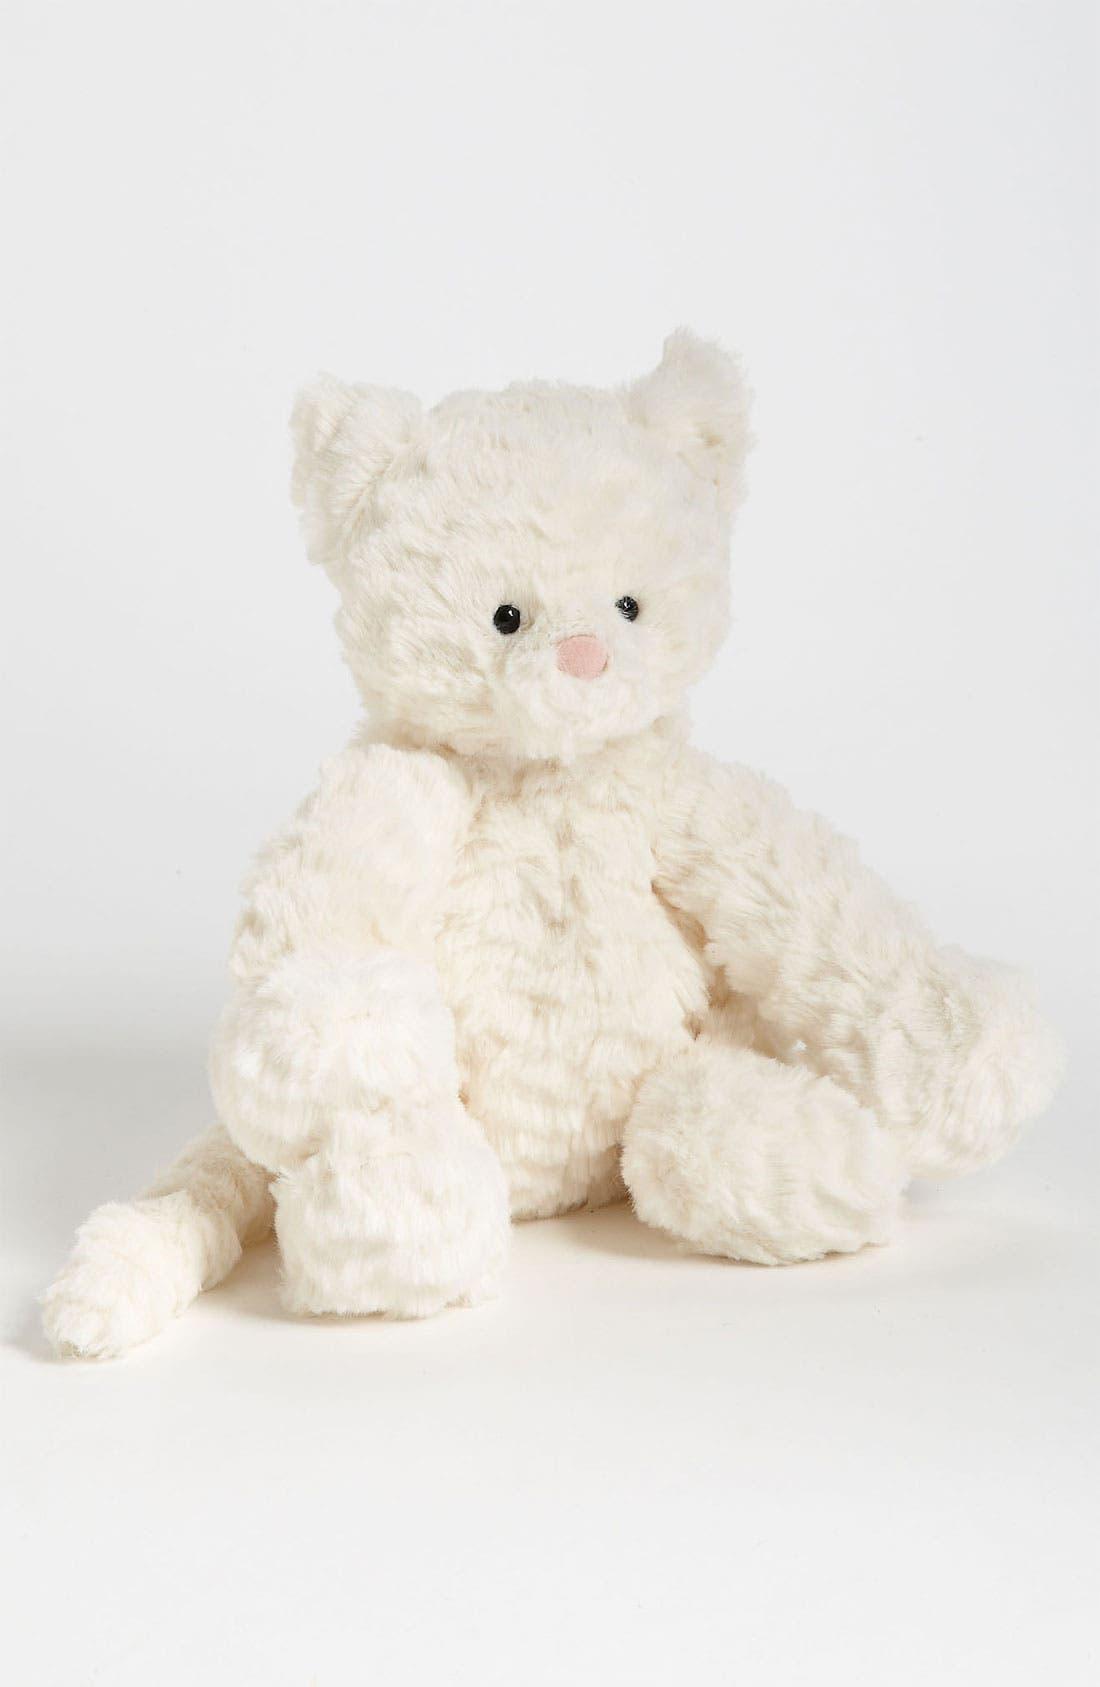 Alternate Image 1 Selected - Jellycat 'Fuddlewuddle Kitty' Stuffed Animal